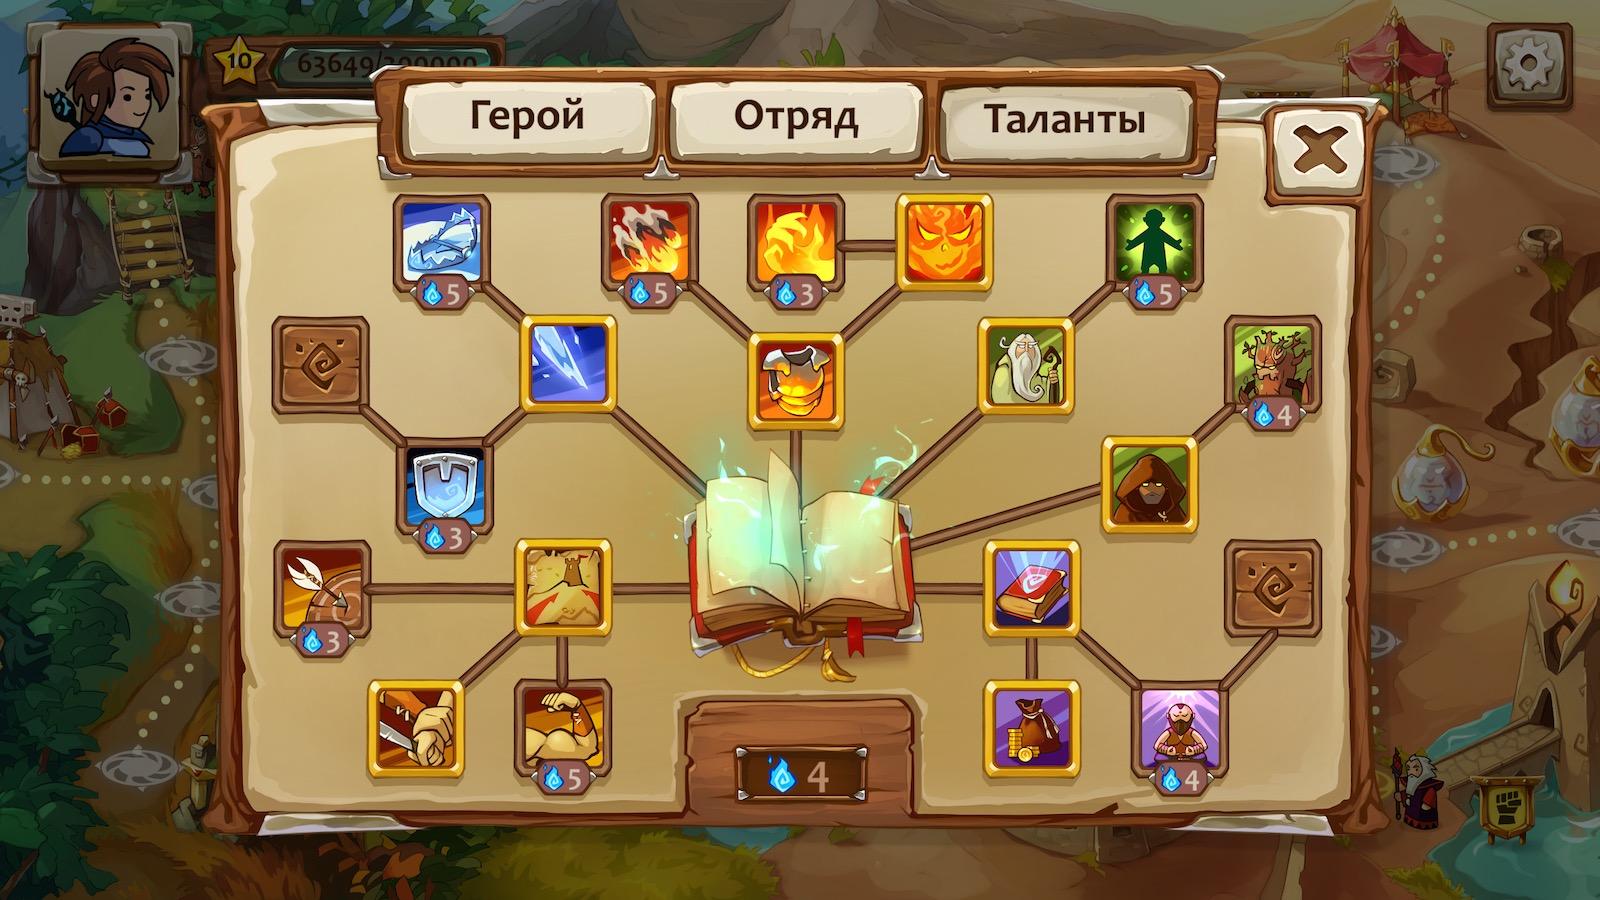 braveland wizard mag chn v yni hrabrozem ya 11 - Braveland Wizard: магічні війни Храброземья